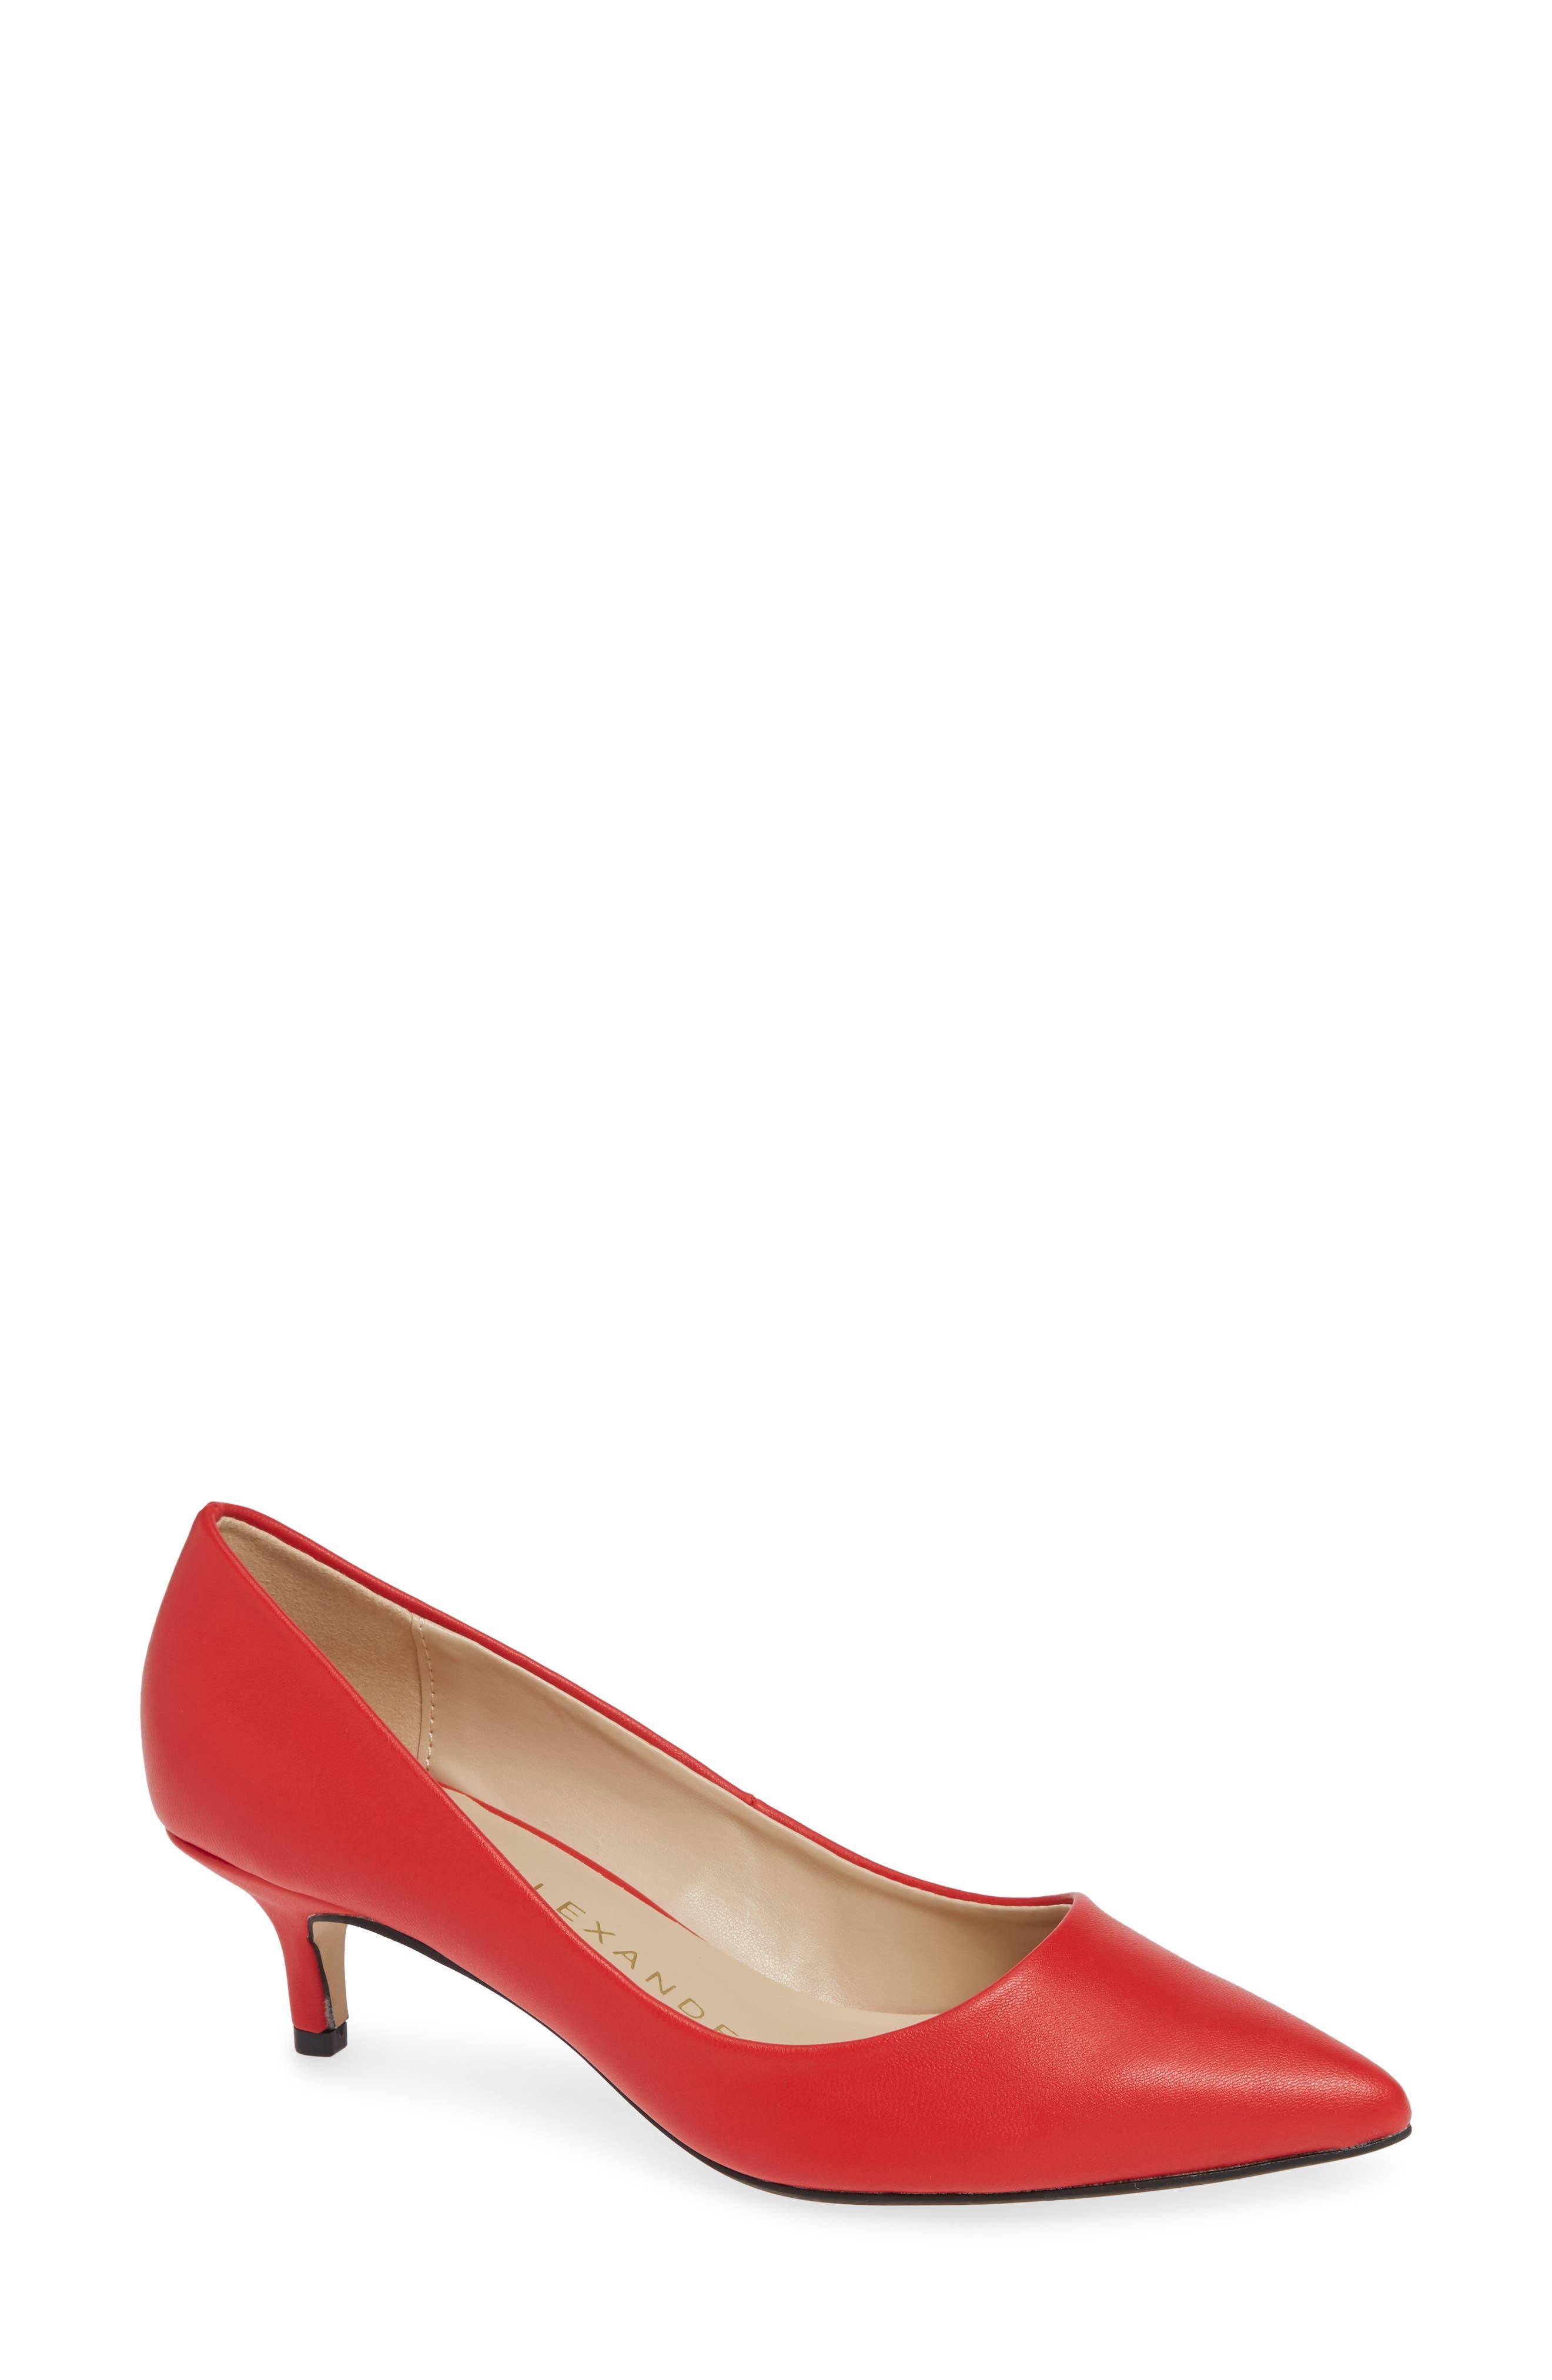 Athena Alexander Target Kitten Heel Pump- Red